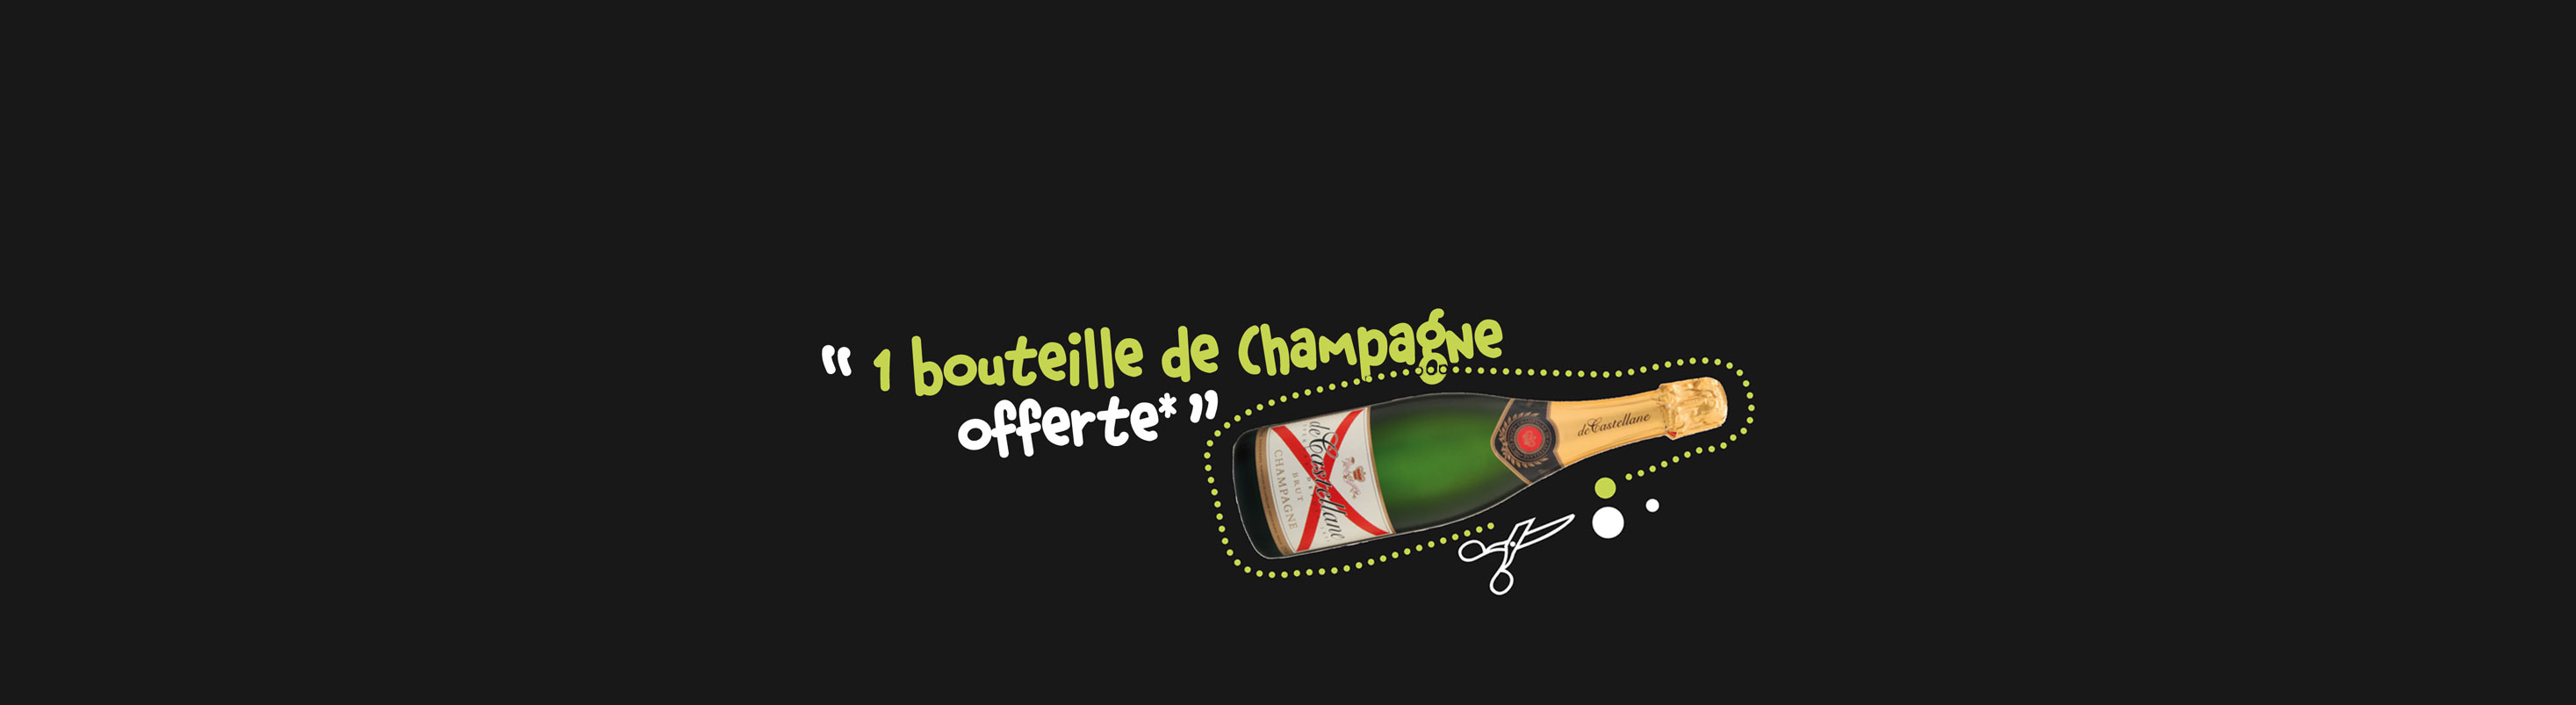 Restaurant Bistro Regent Votre Bouteille De Champagne Offerte